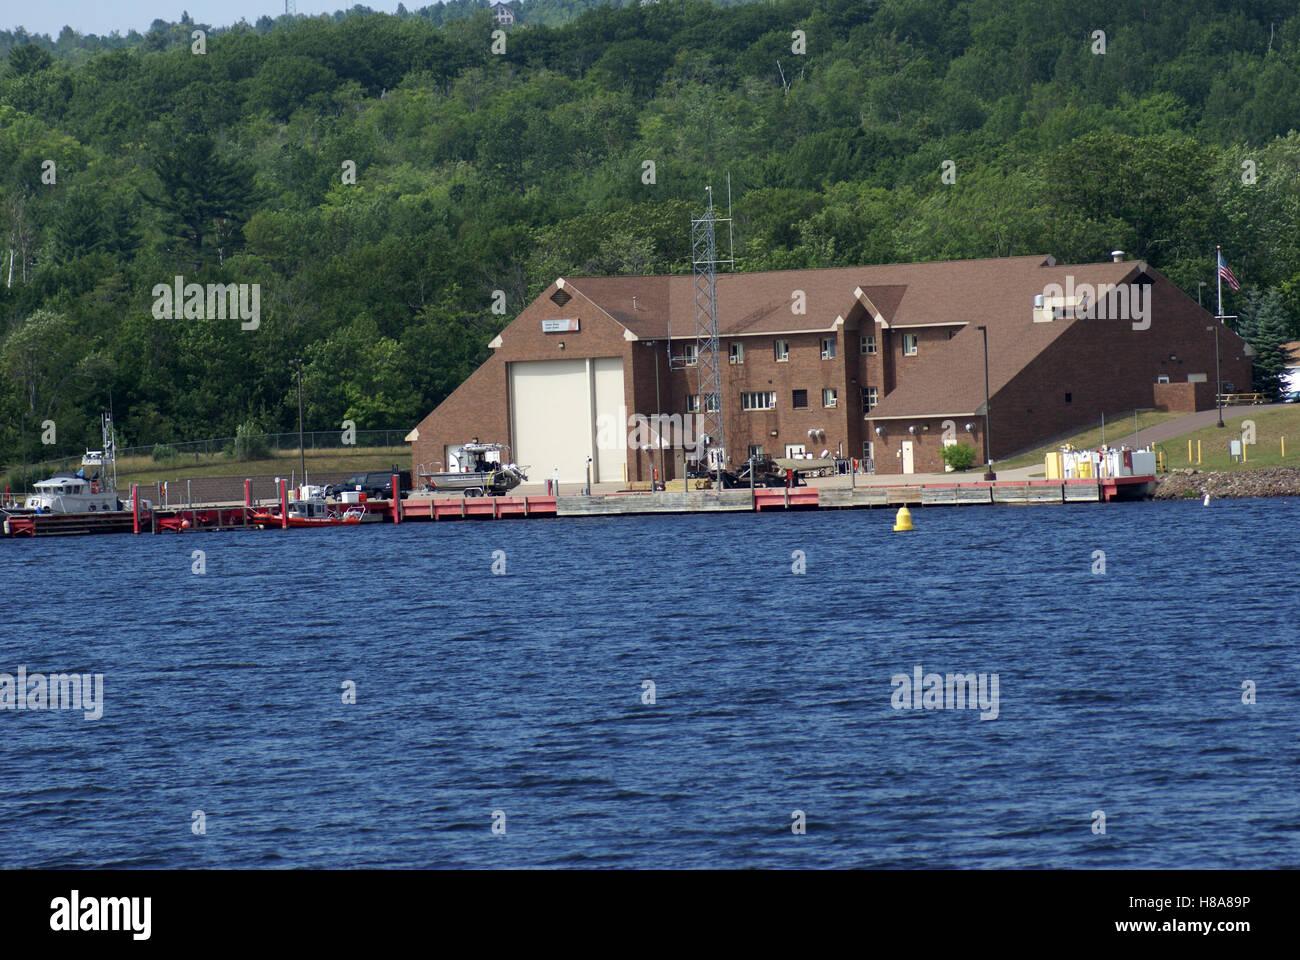 Coast Guard Station on the shore of Portage Lake - Stock Image